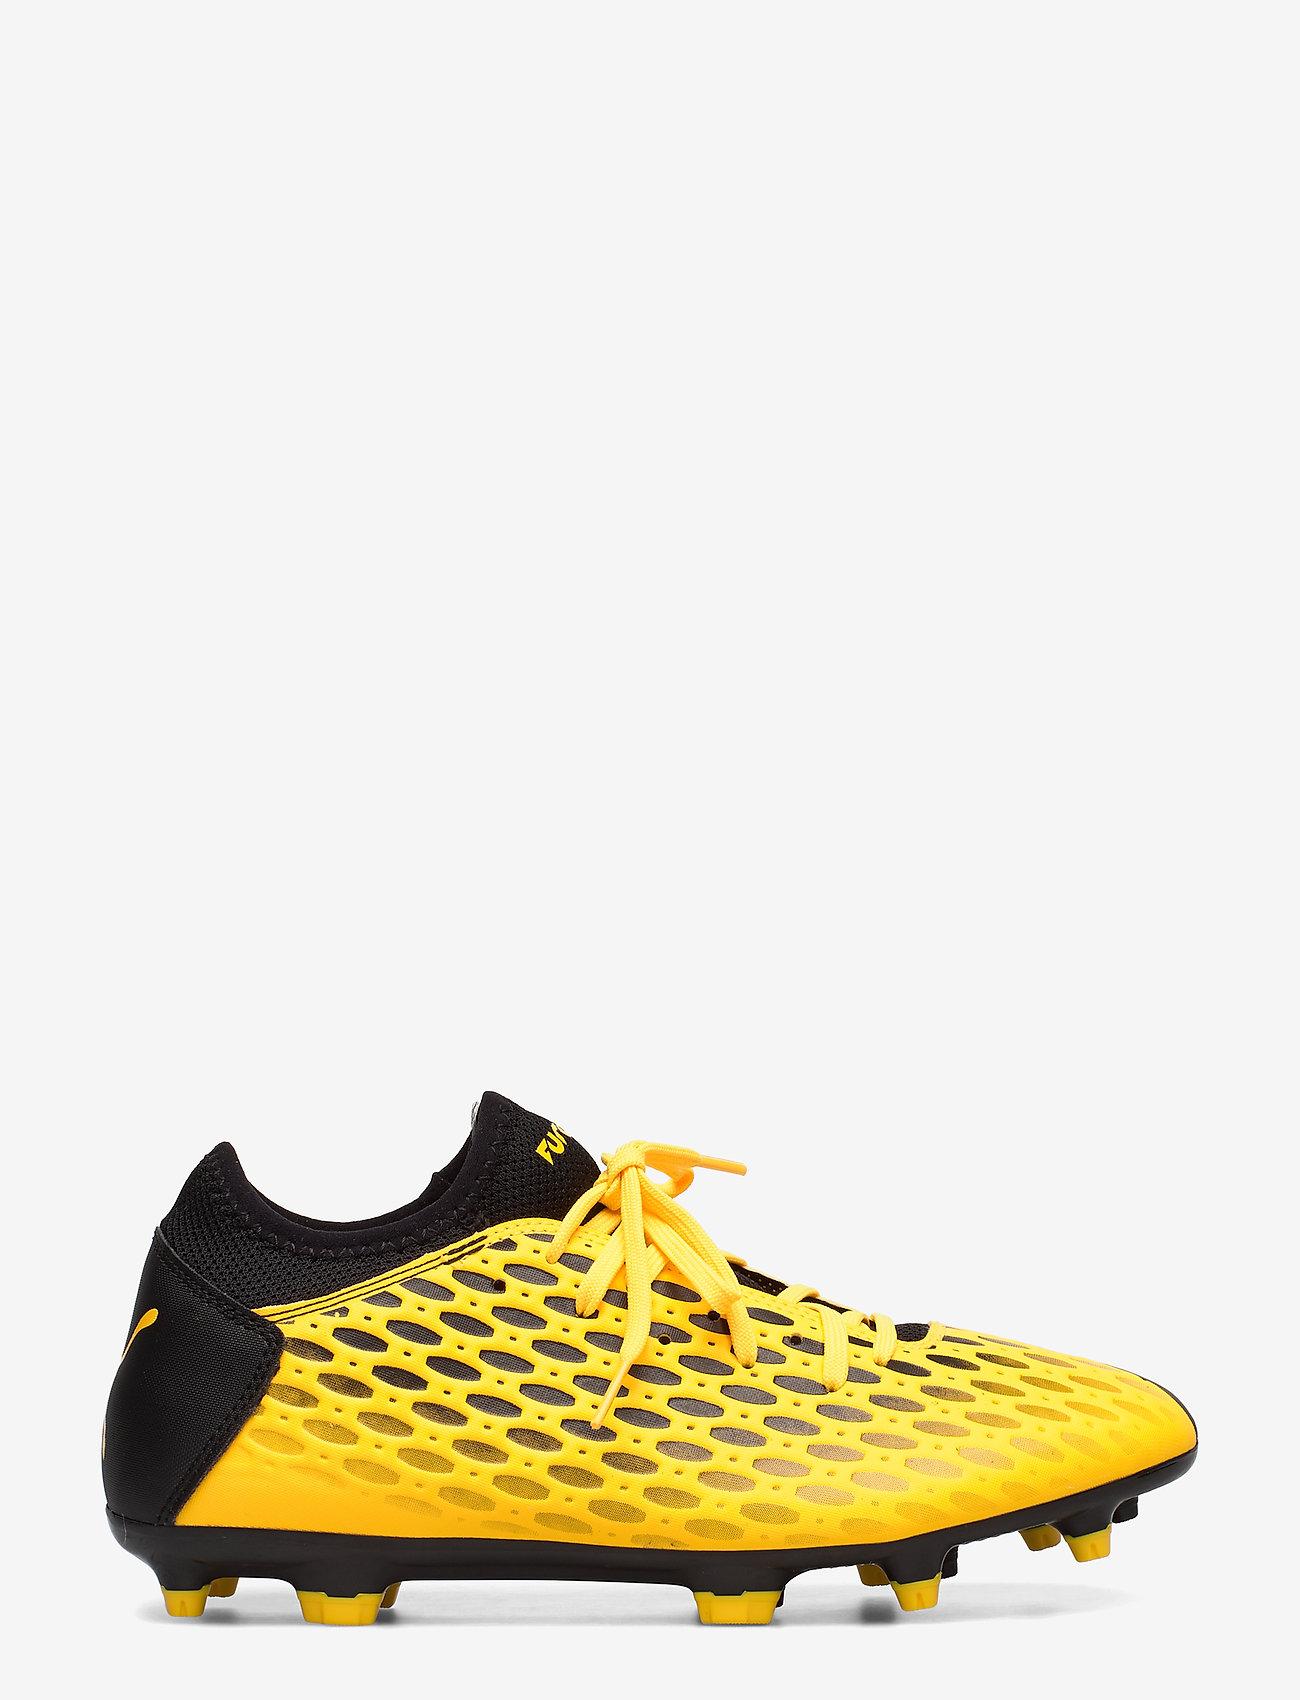 PUMA - FUTURE 5.4 FG/AG - jalkapallokengät - ultra yellow-puma black - 1